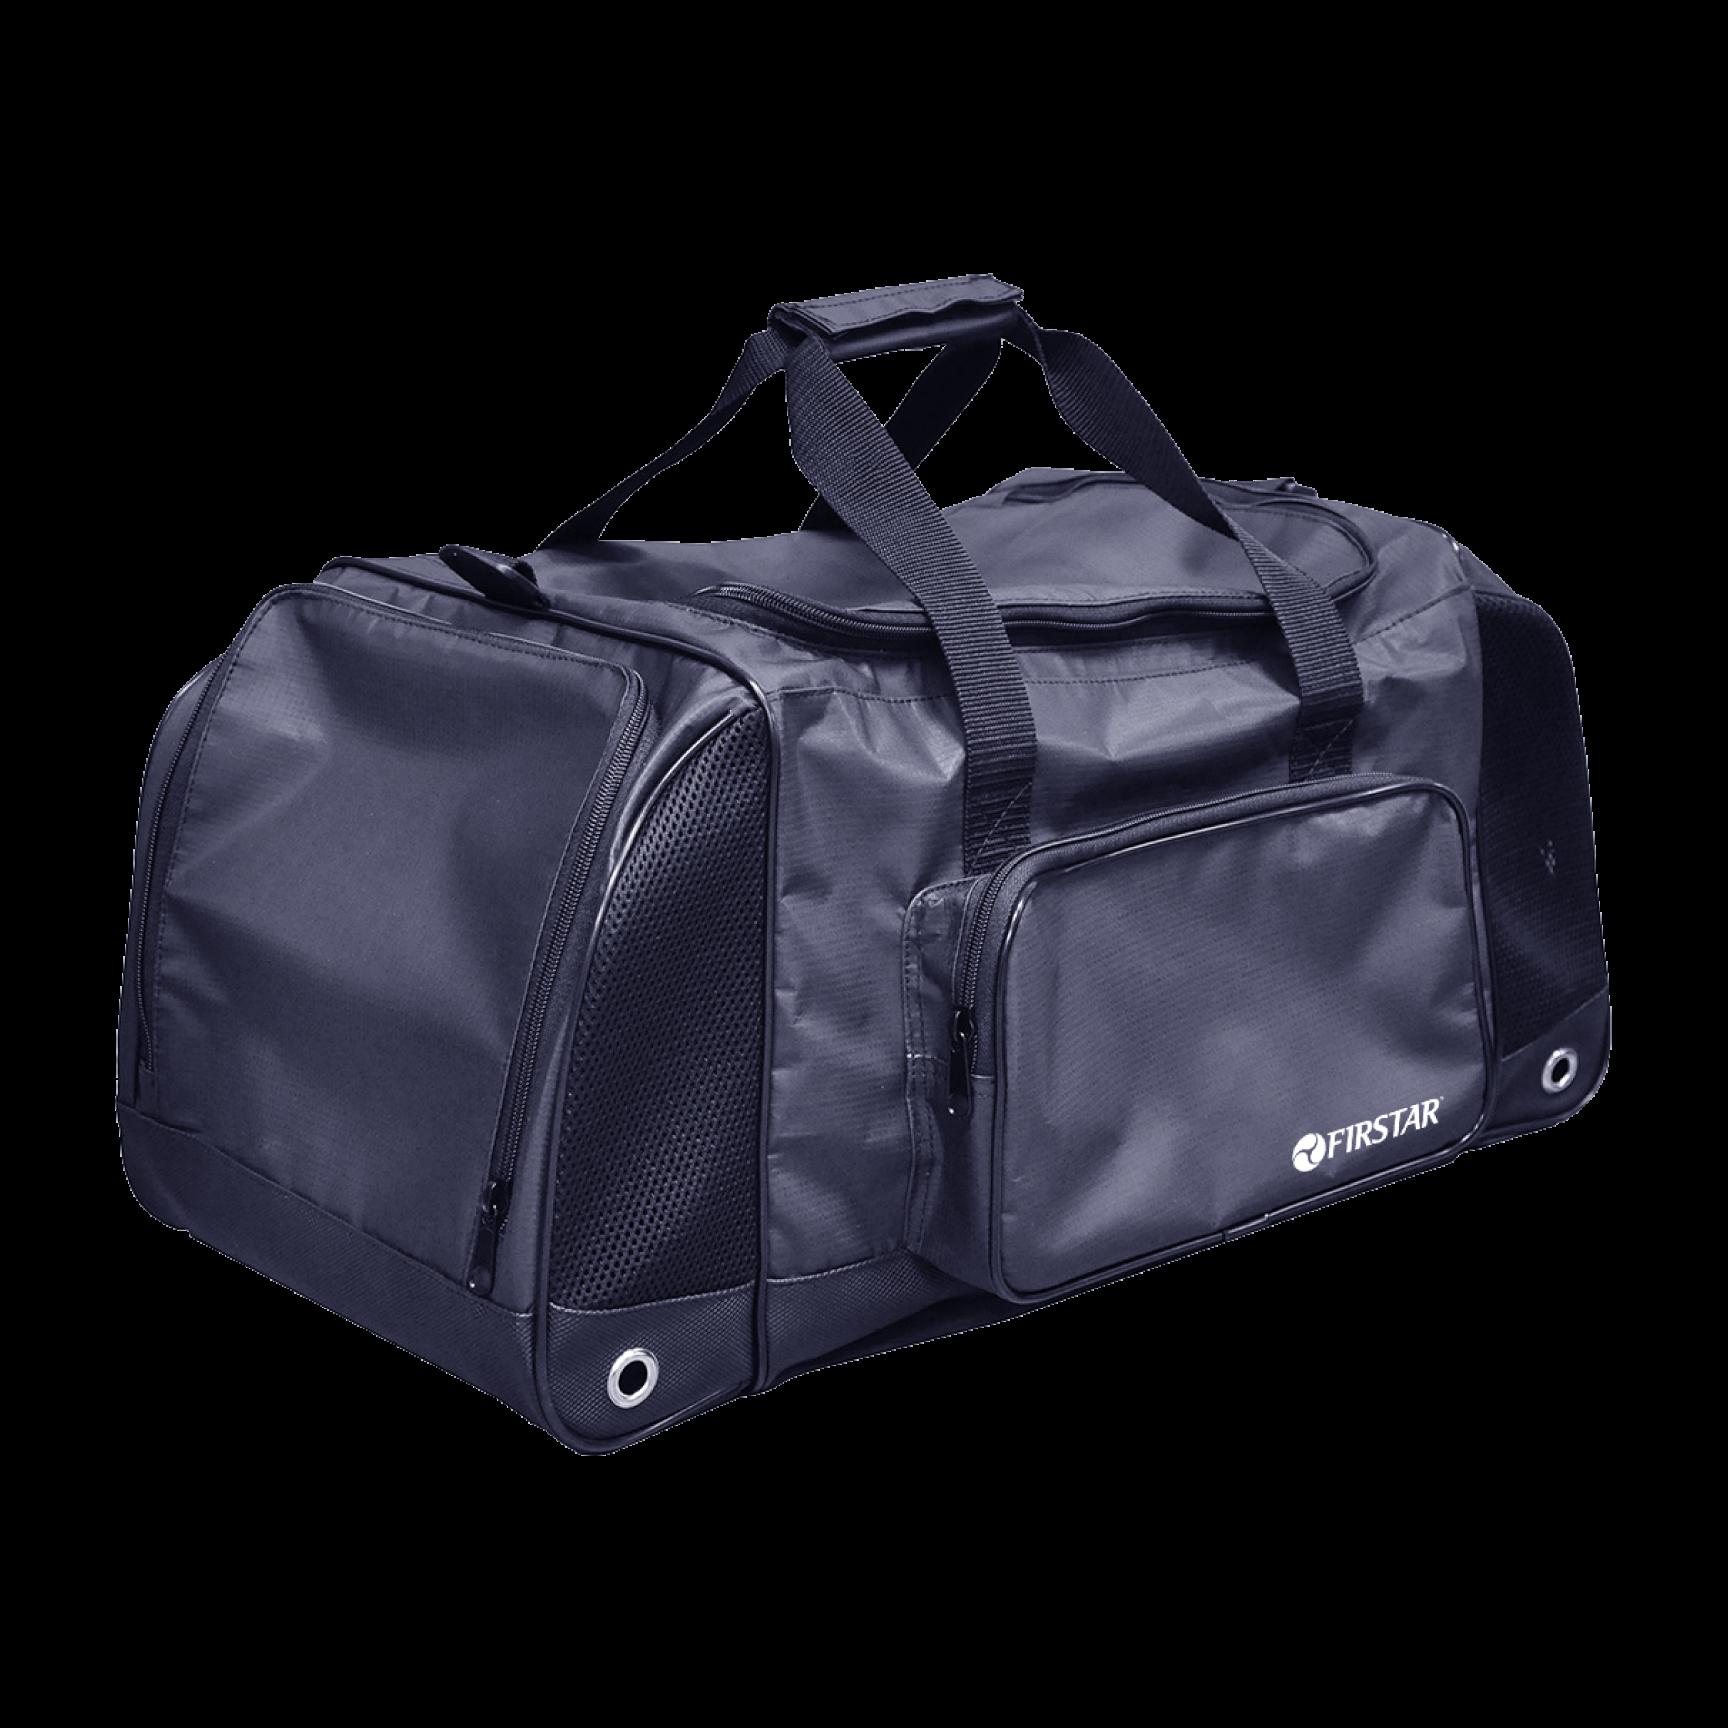 Firstar---Coaches-Bag.png